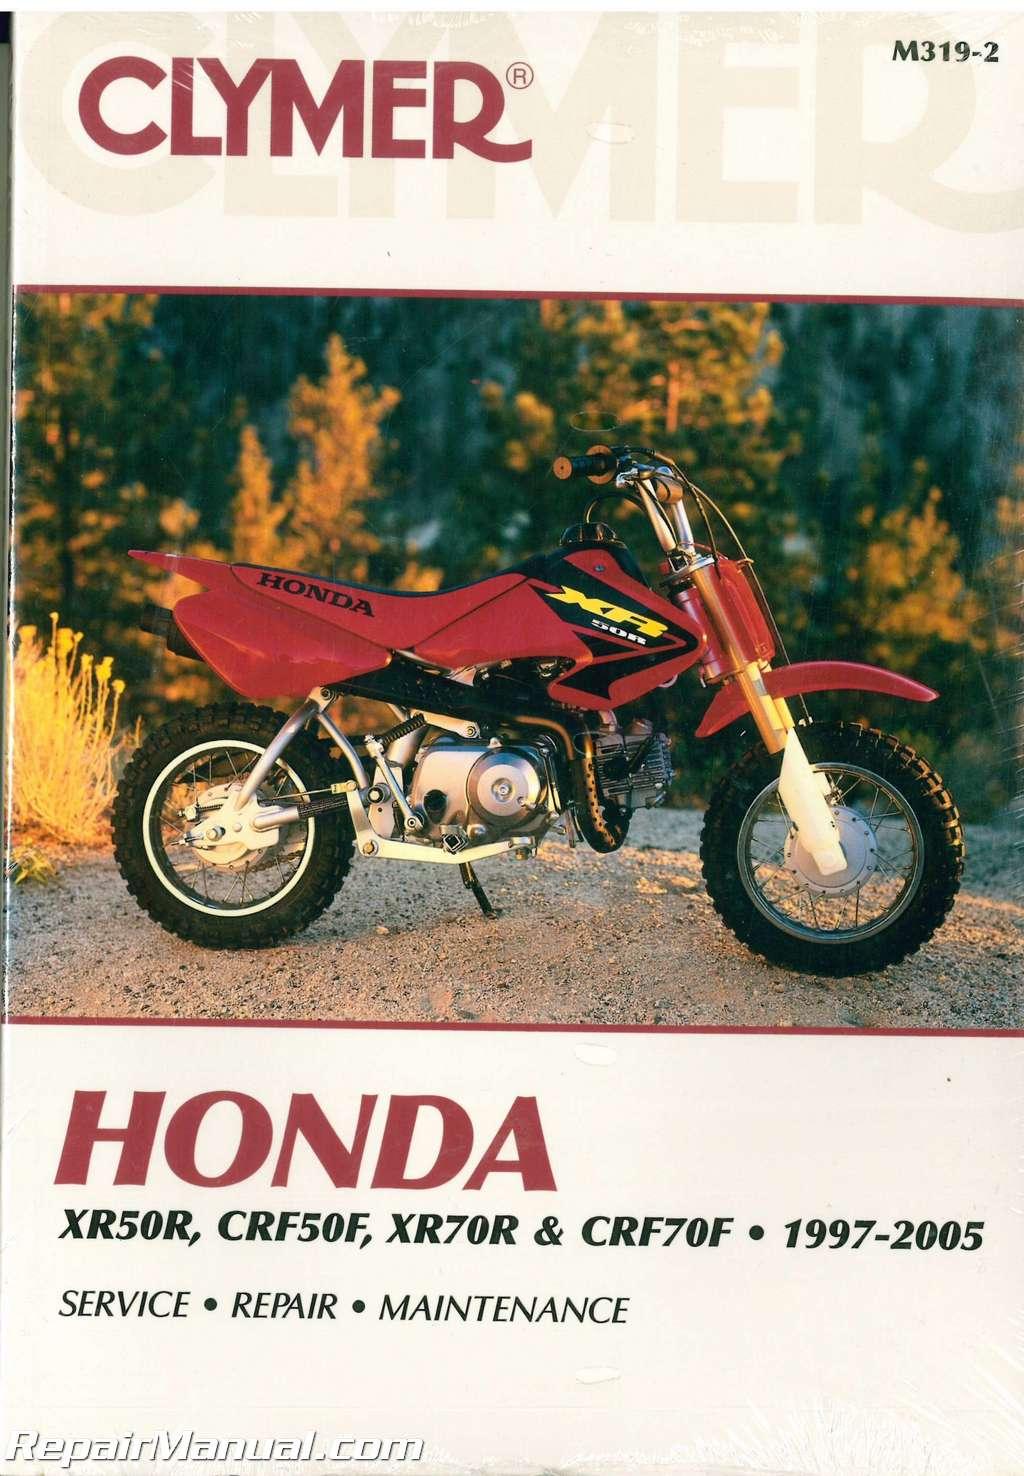 hight resolution of honda xr50r crf50f xr70r and crf70f 1997 2005